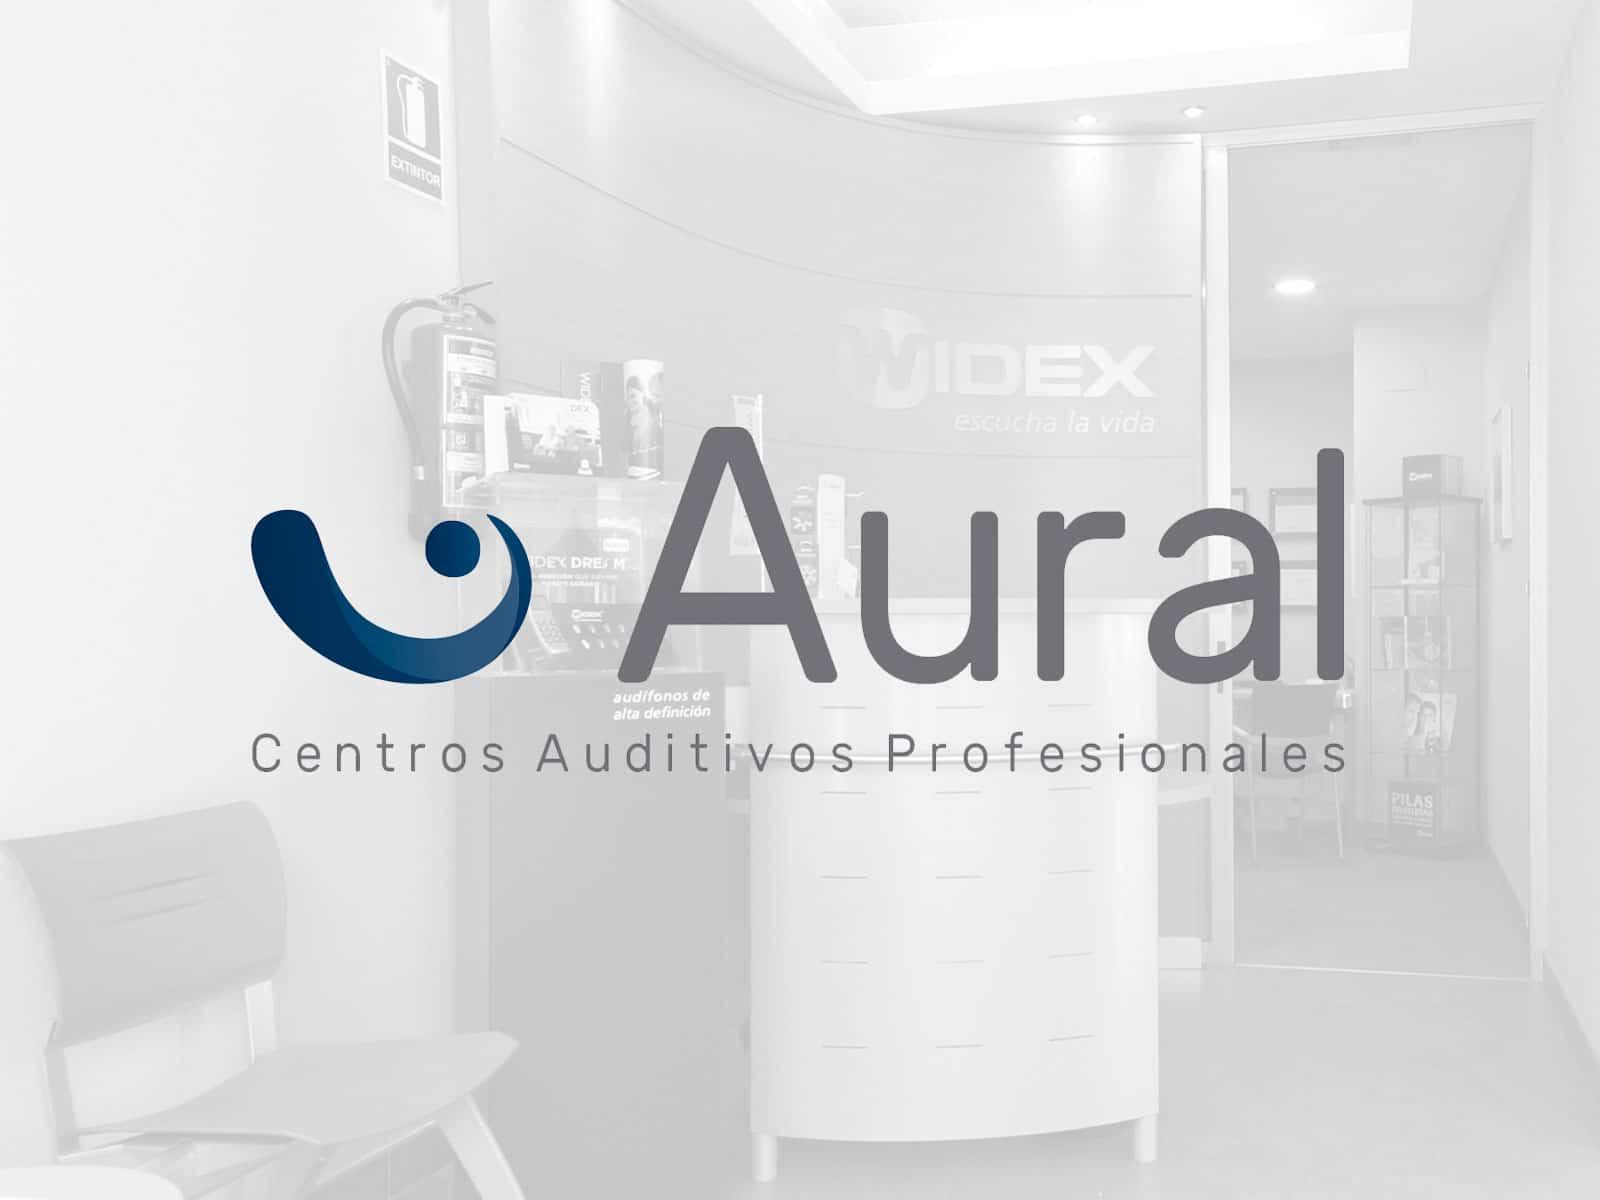 Logotipo AURAL centros auditivos profesionales